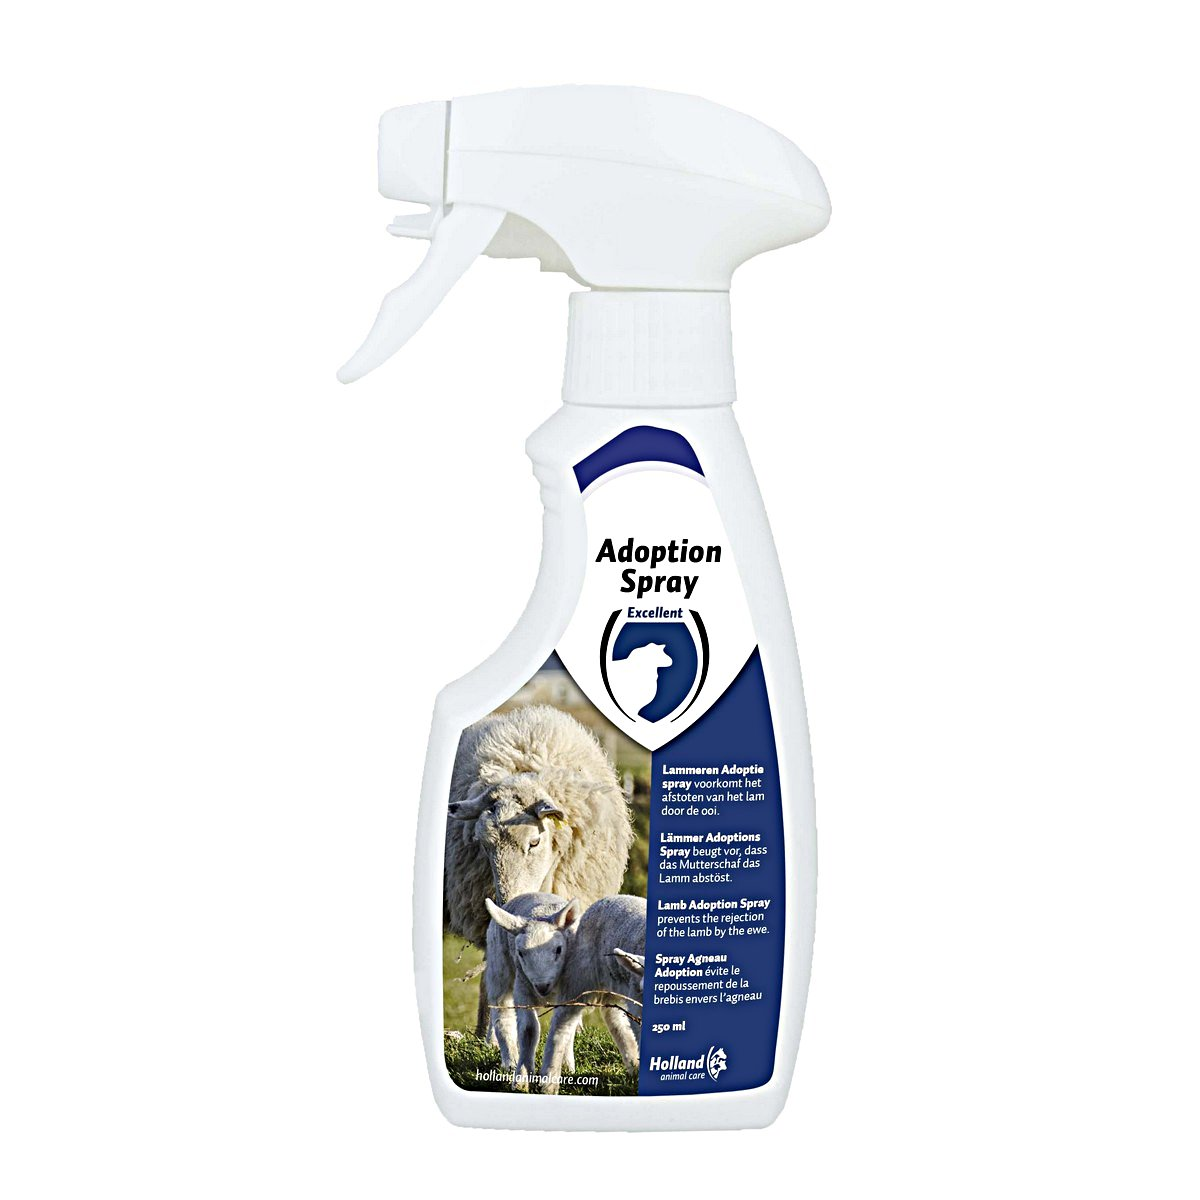 Image of Agradi Adoption Spray 250 ml